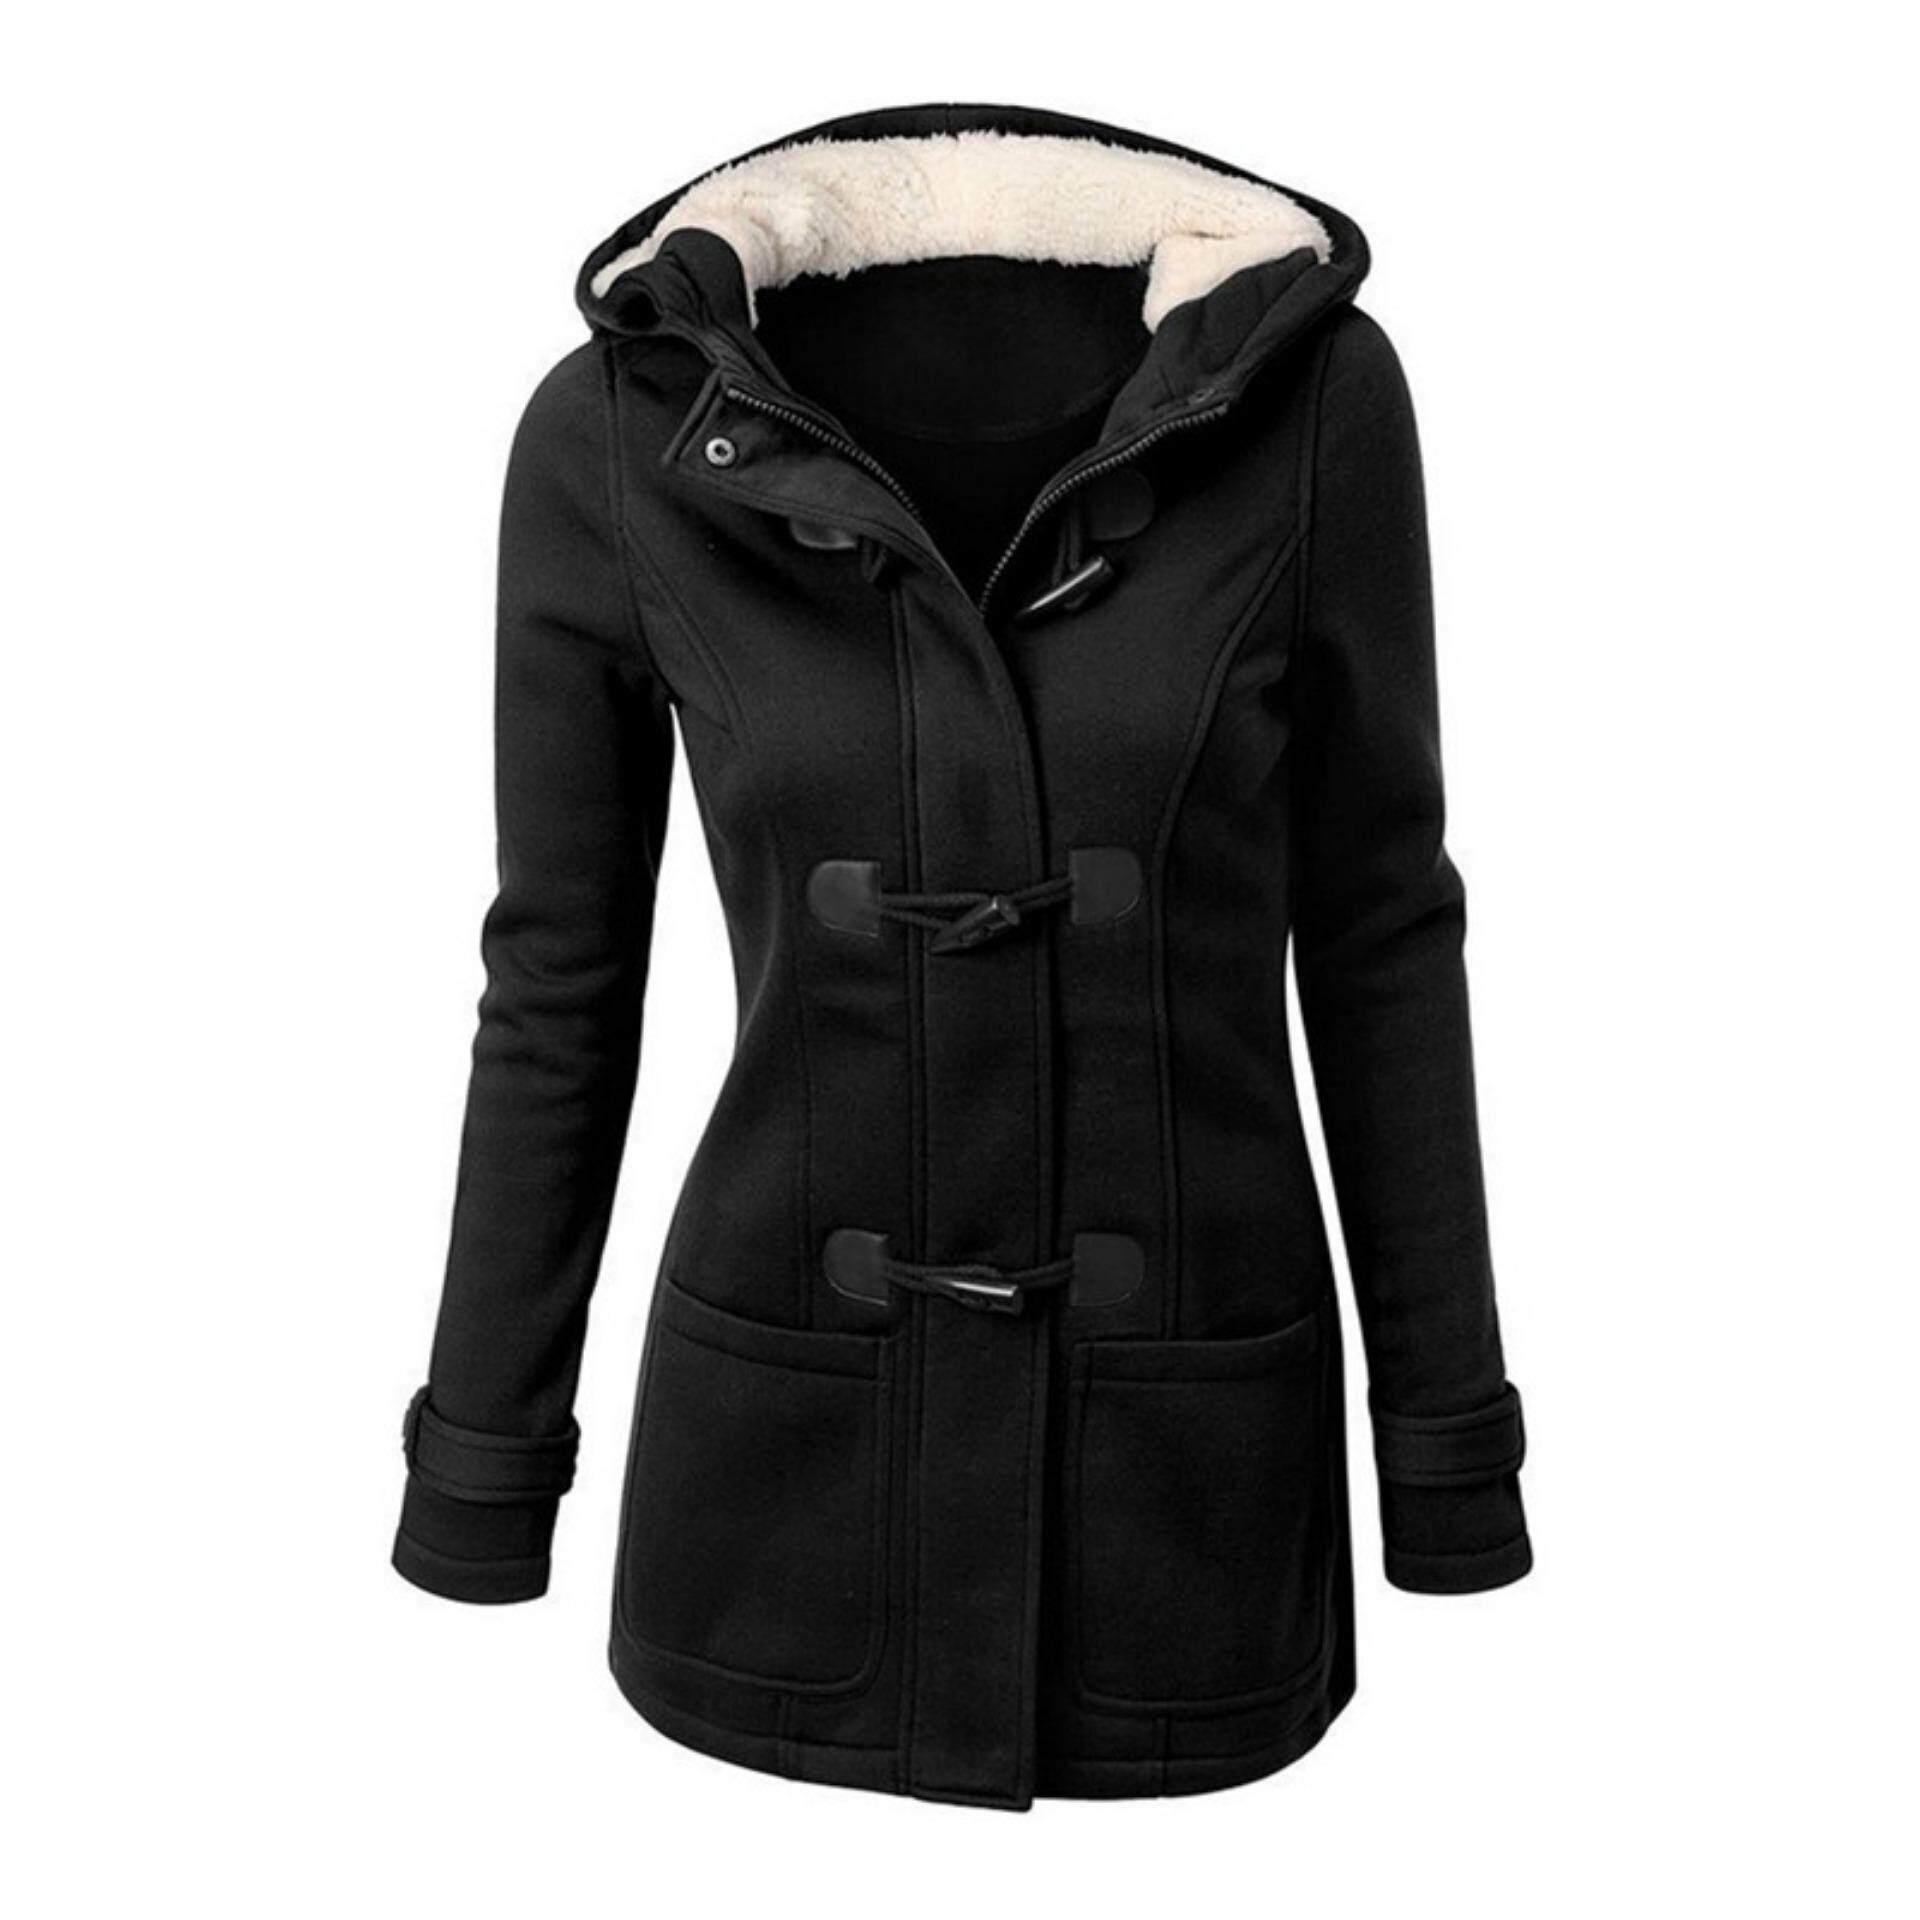 79d1b1b6eb355 Double-Breasted Winter Coat Women Jacket Coat Hoodies Parka Female Winter  Autumn